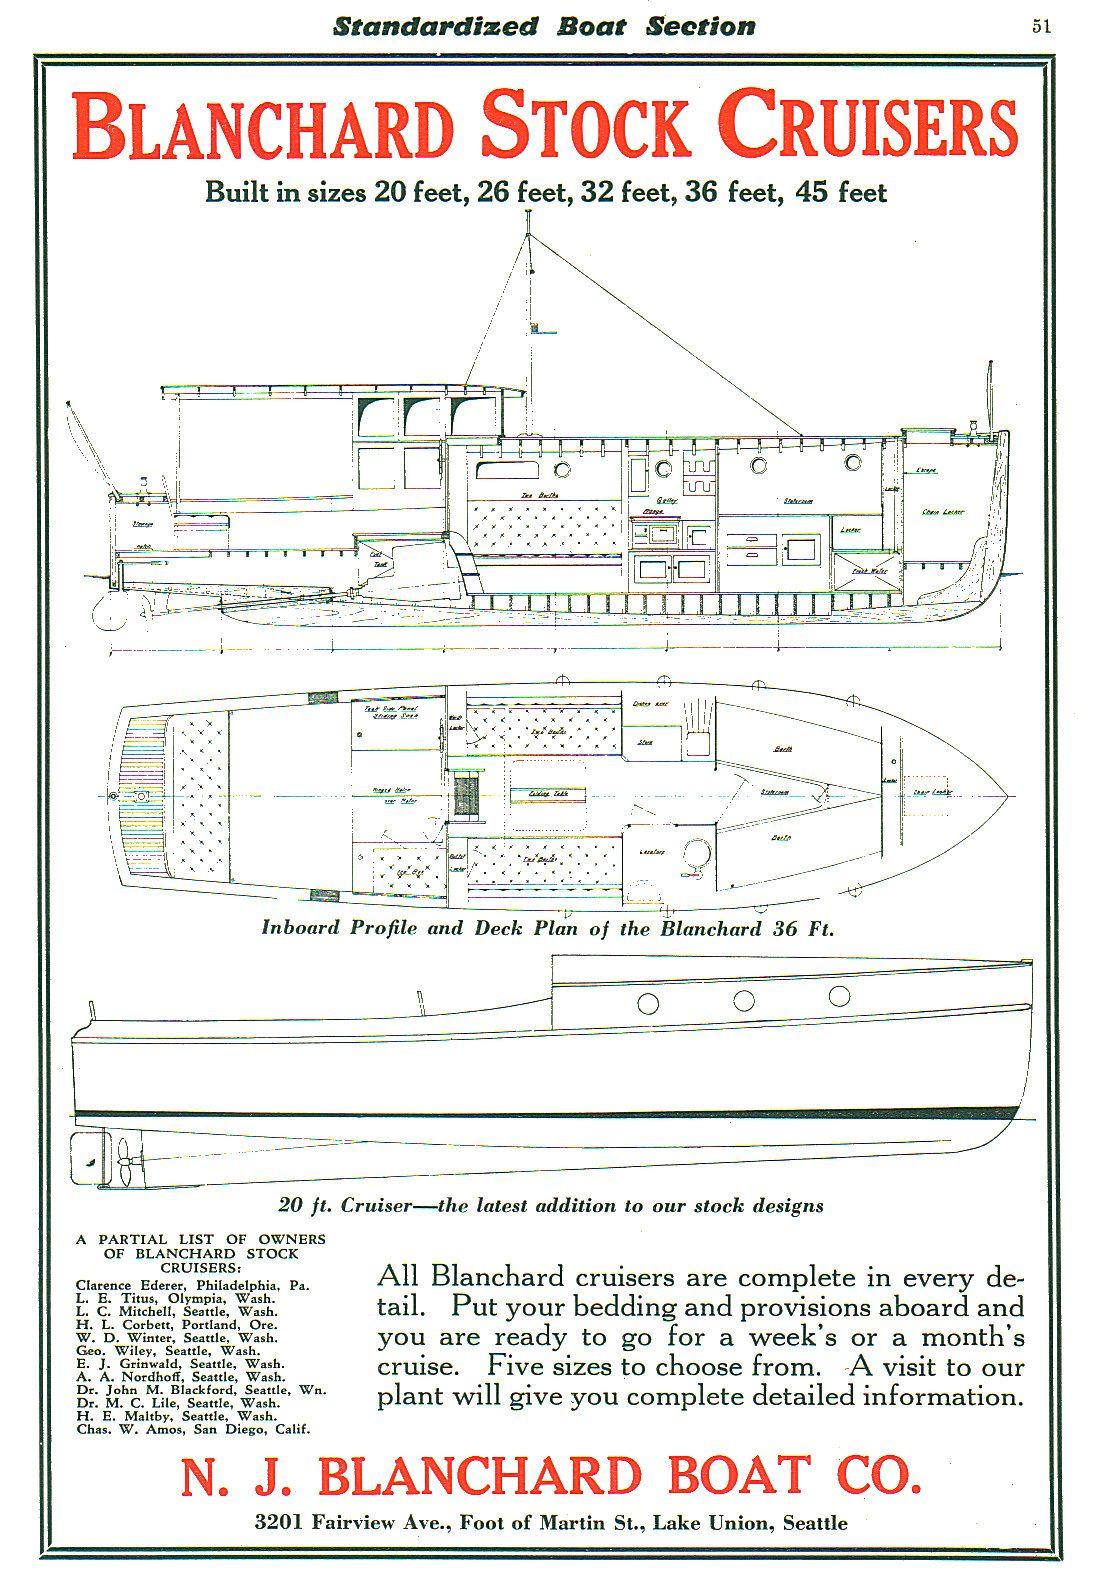 blanchardstockcruisers-ad.jpg (1093×1587)